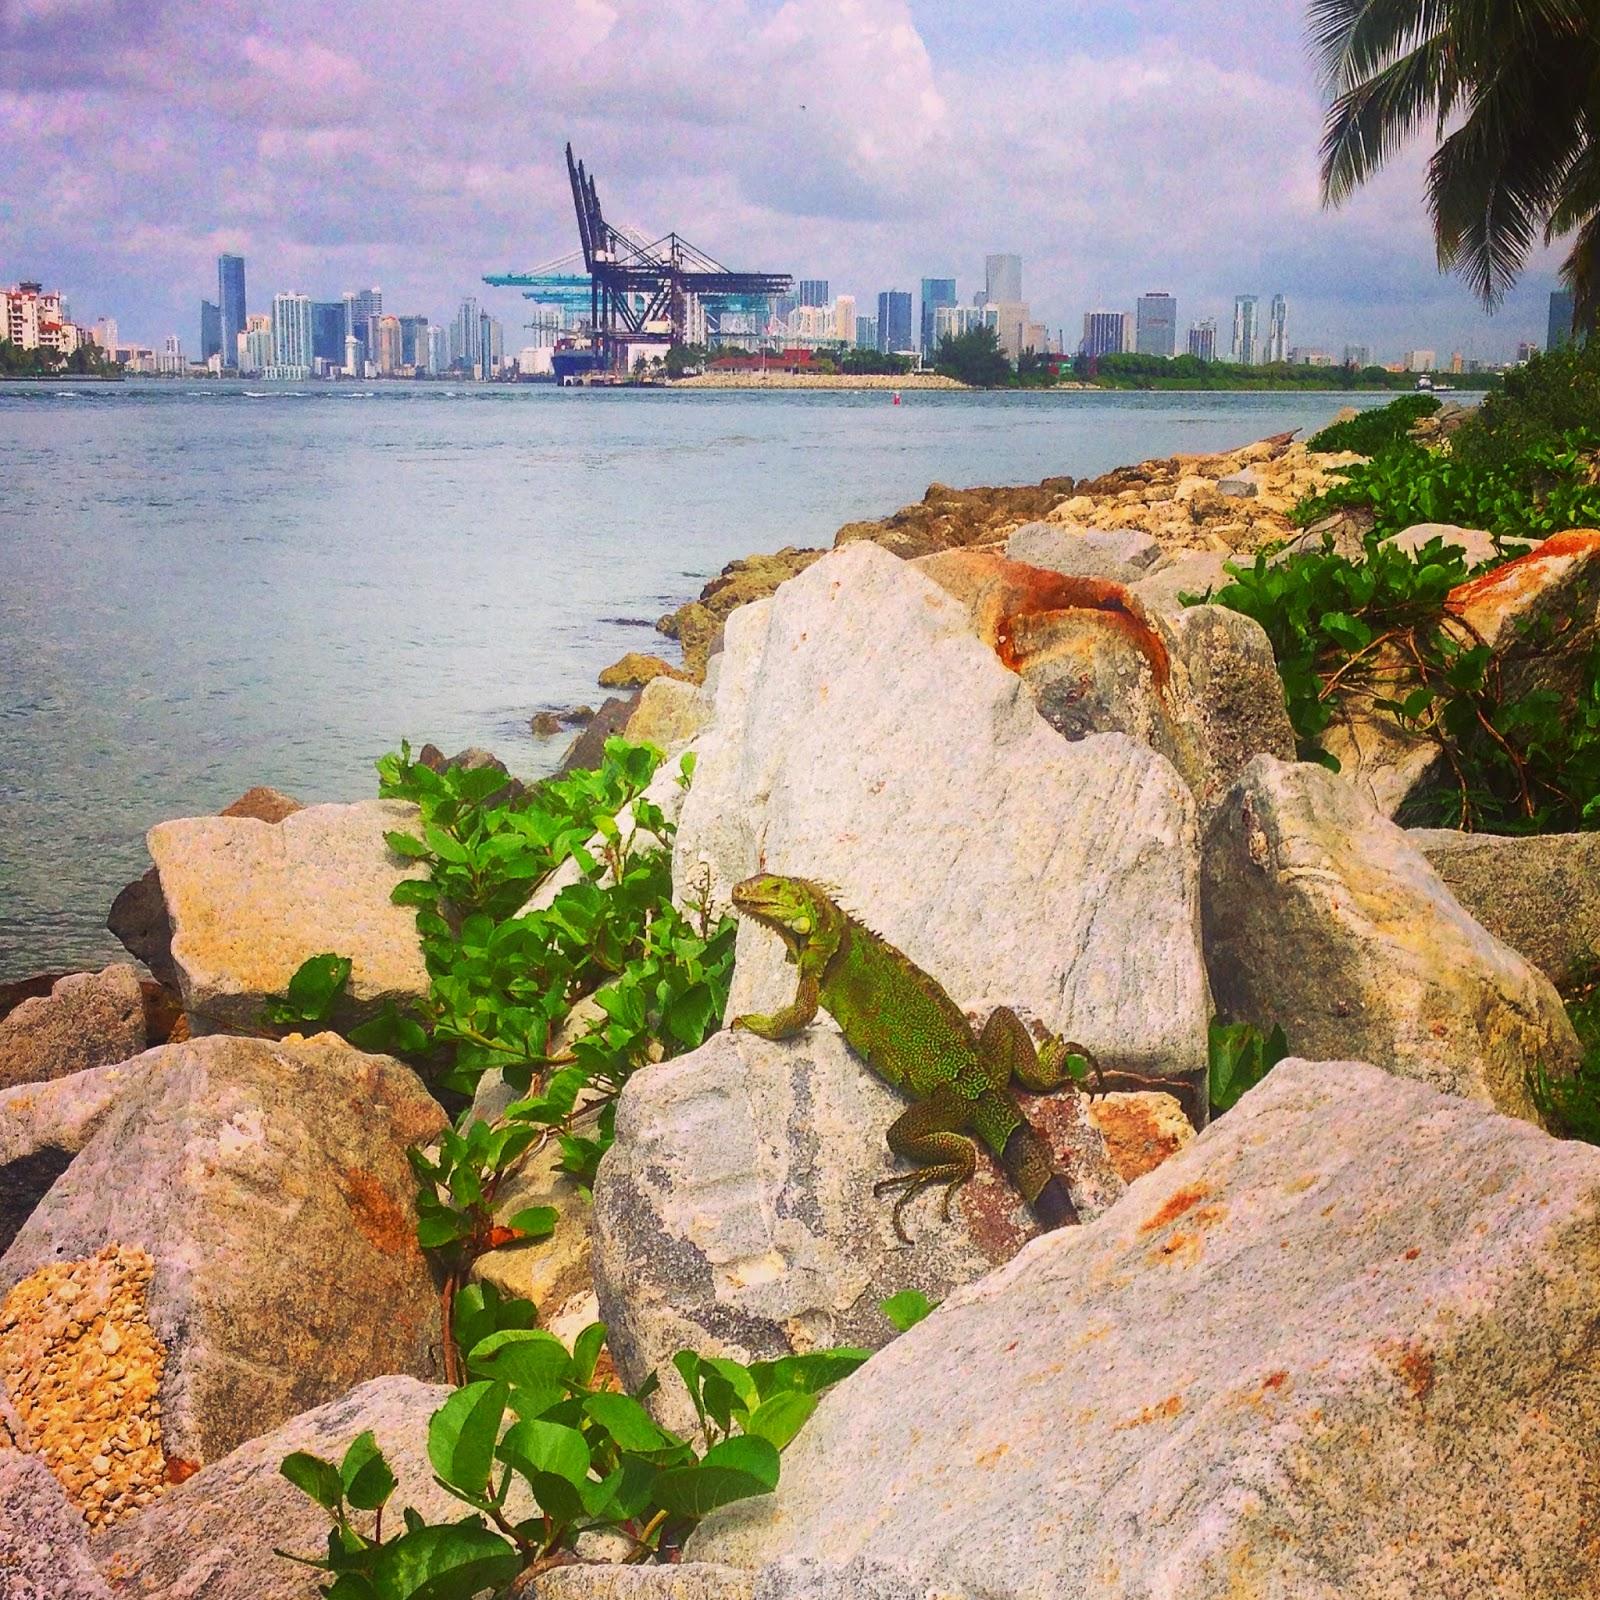 The US Part 1: Miami